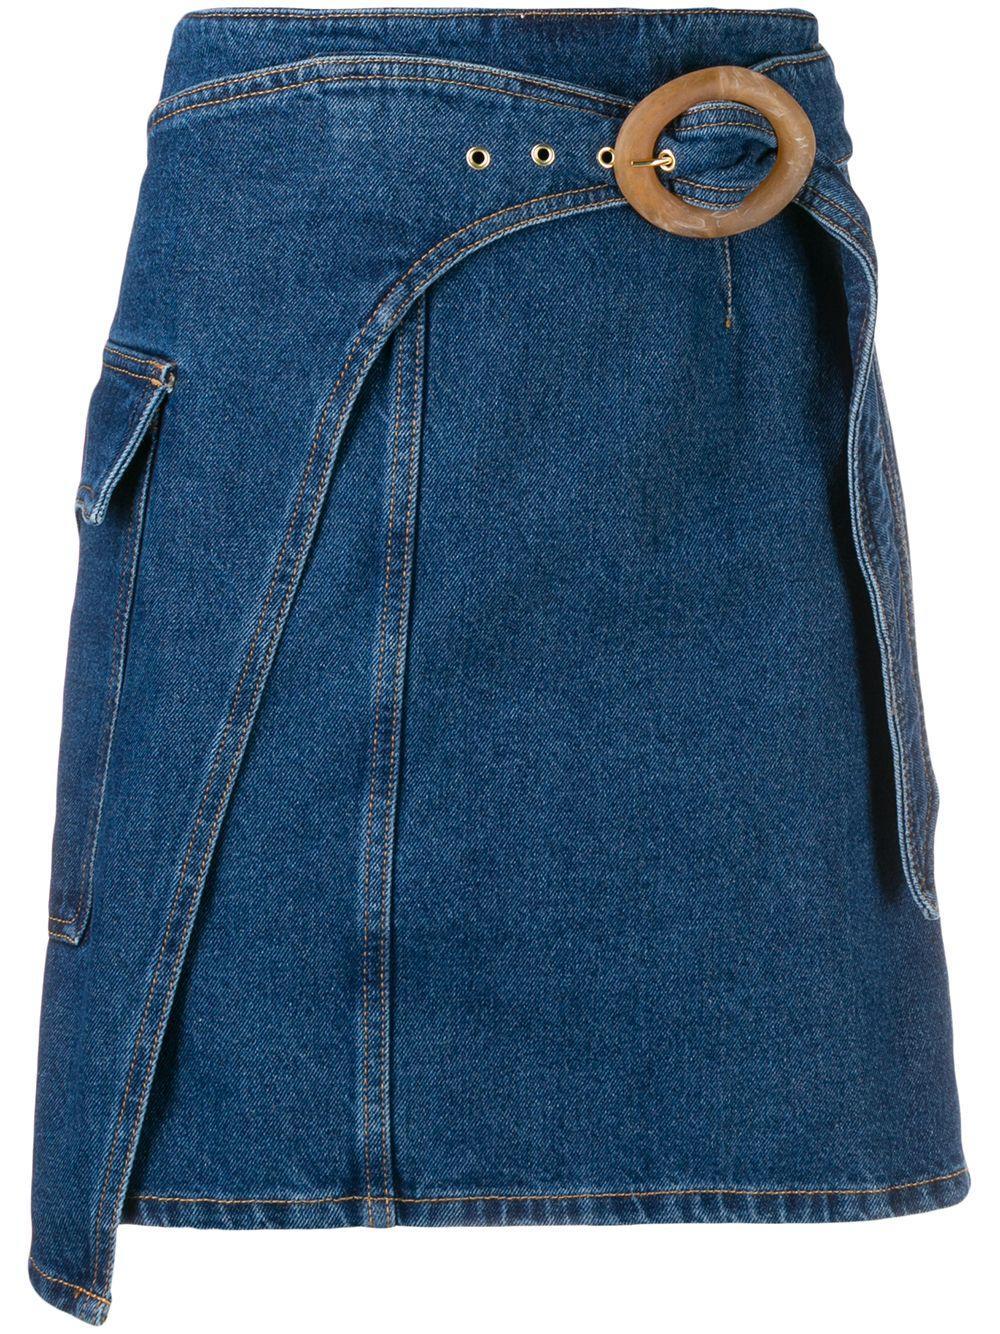 Nanushka джинсовая юбка с пряжкой